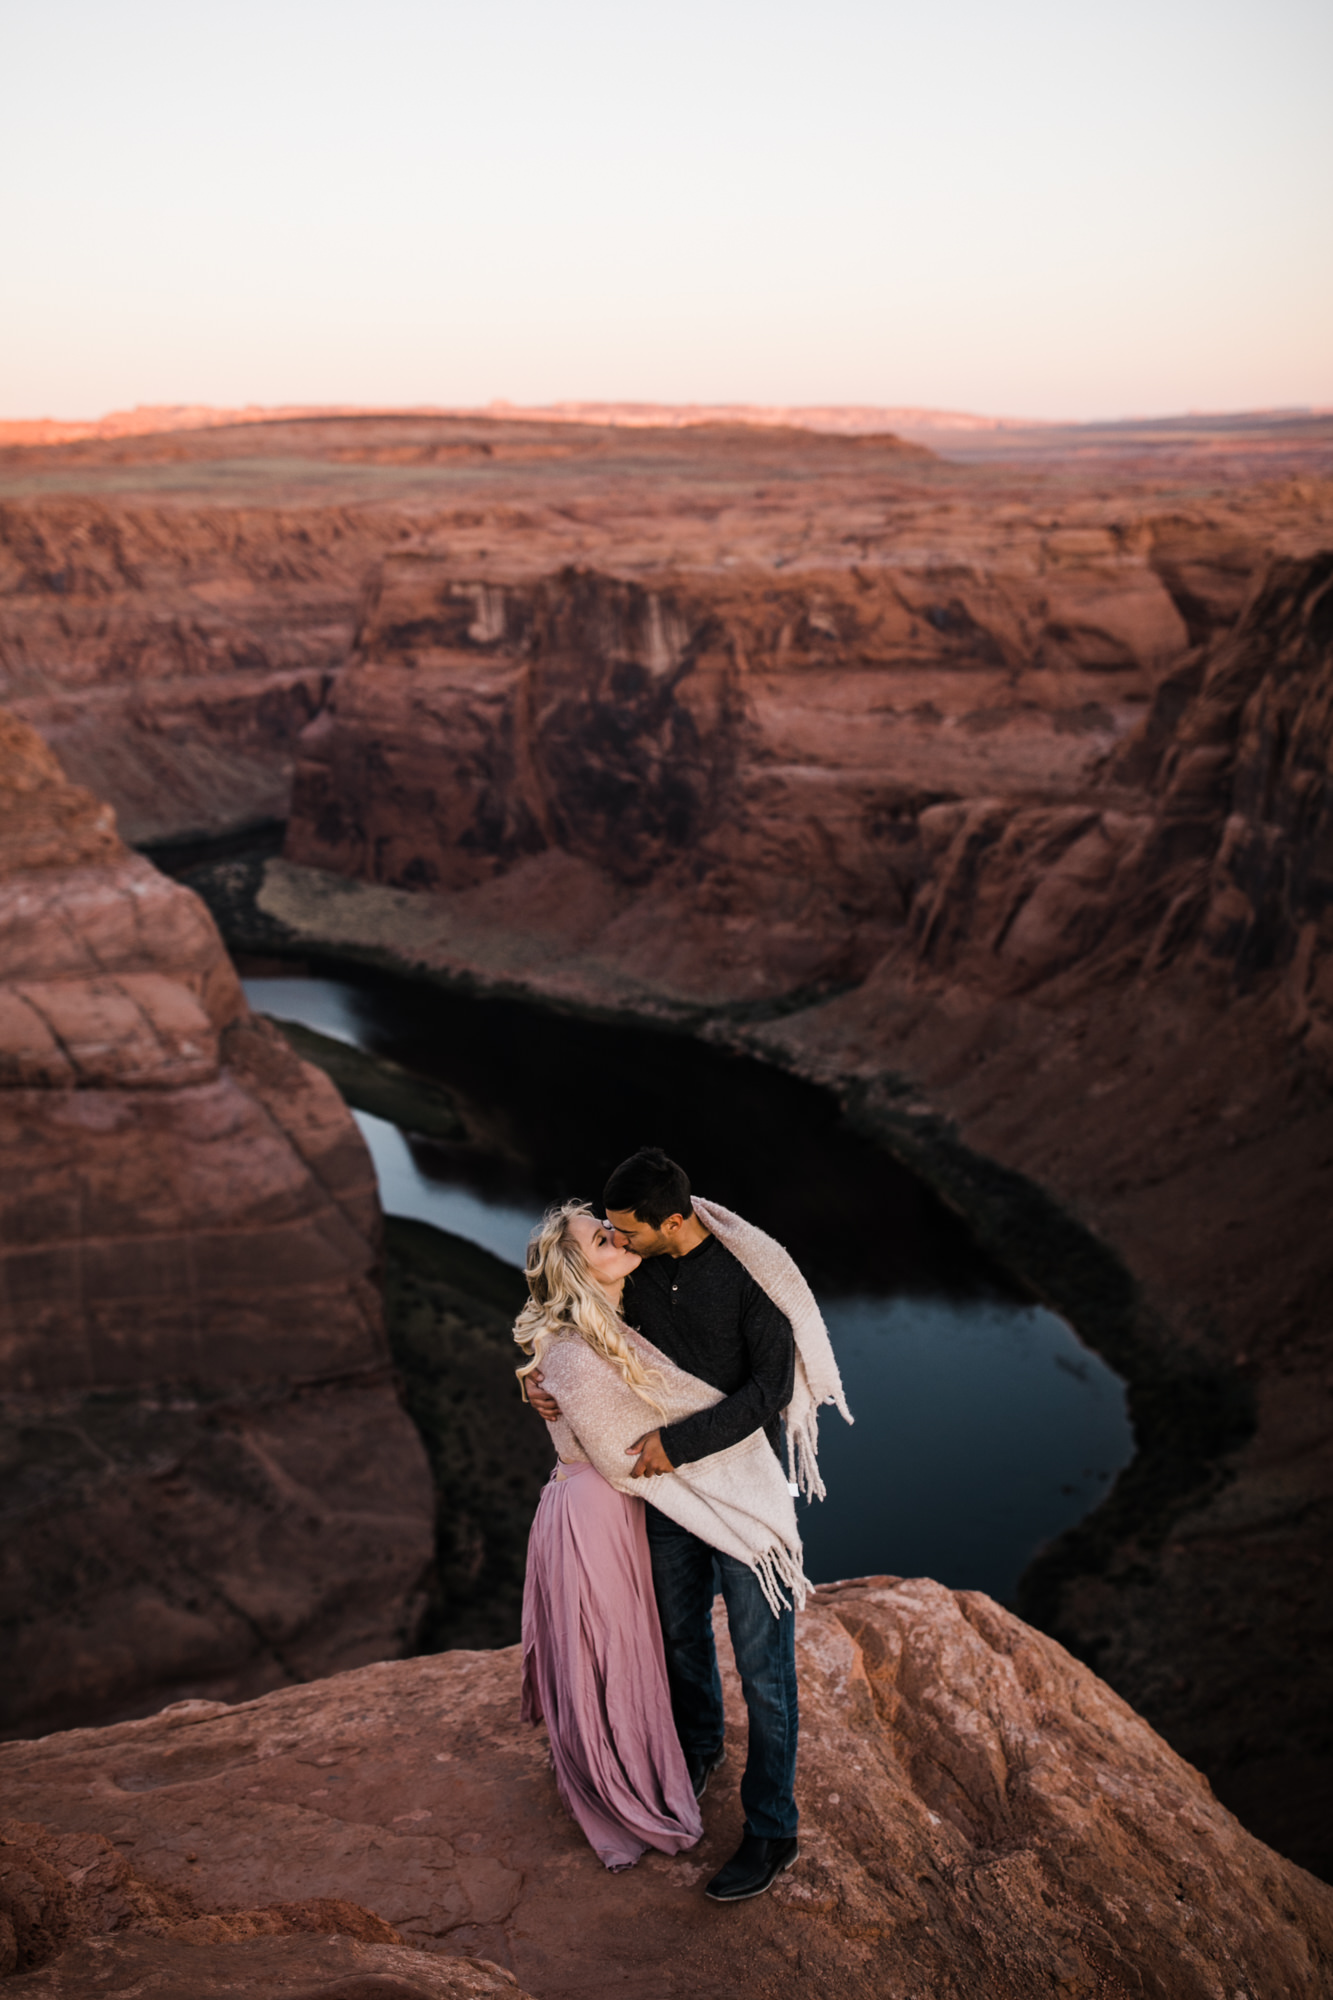 adventure elopement session at horseshoe bend | destination engagement photo inspiration | utah adventure elopement photographers | the hearnes adventure photography | www.thehearnes.com